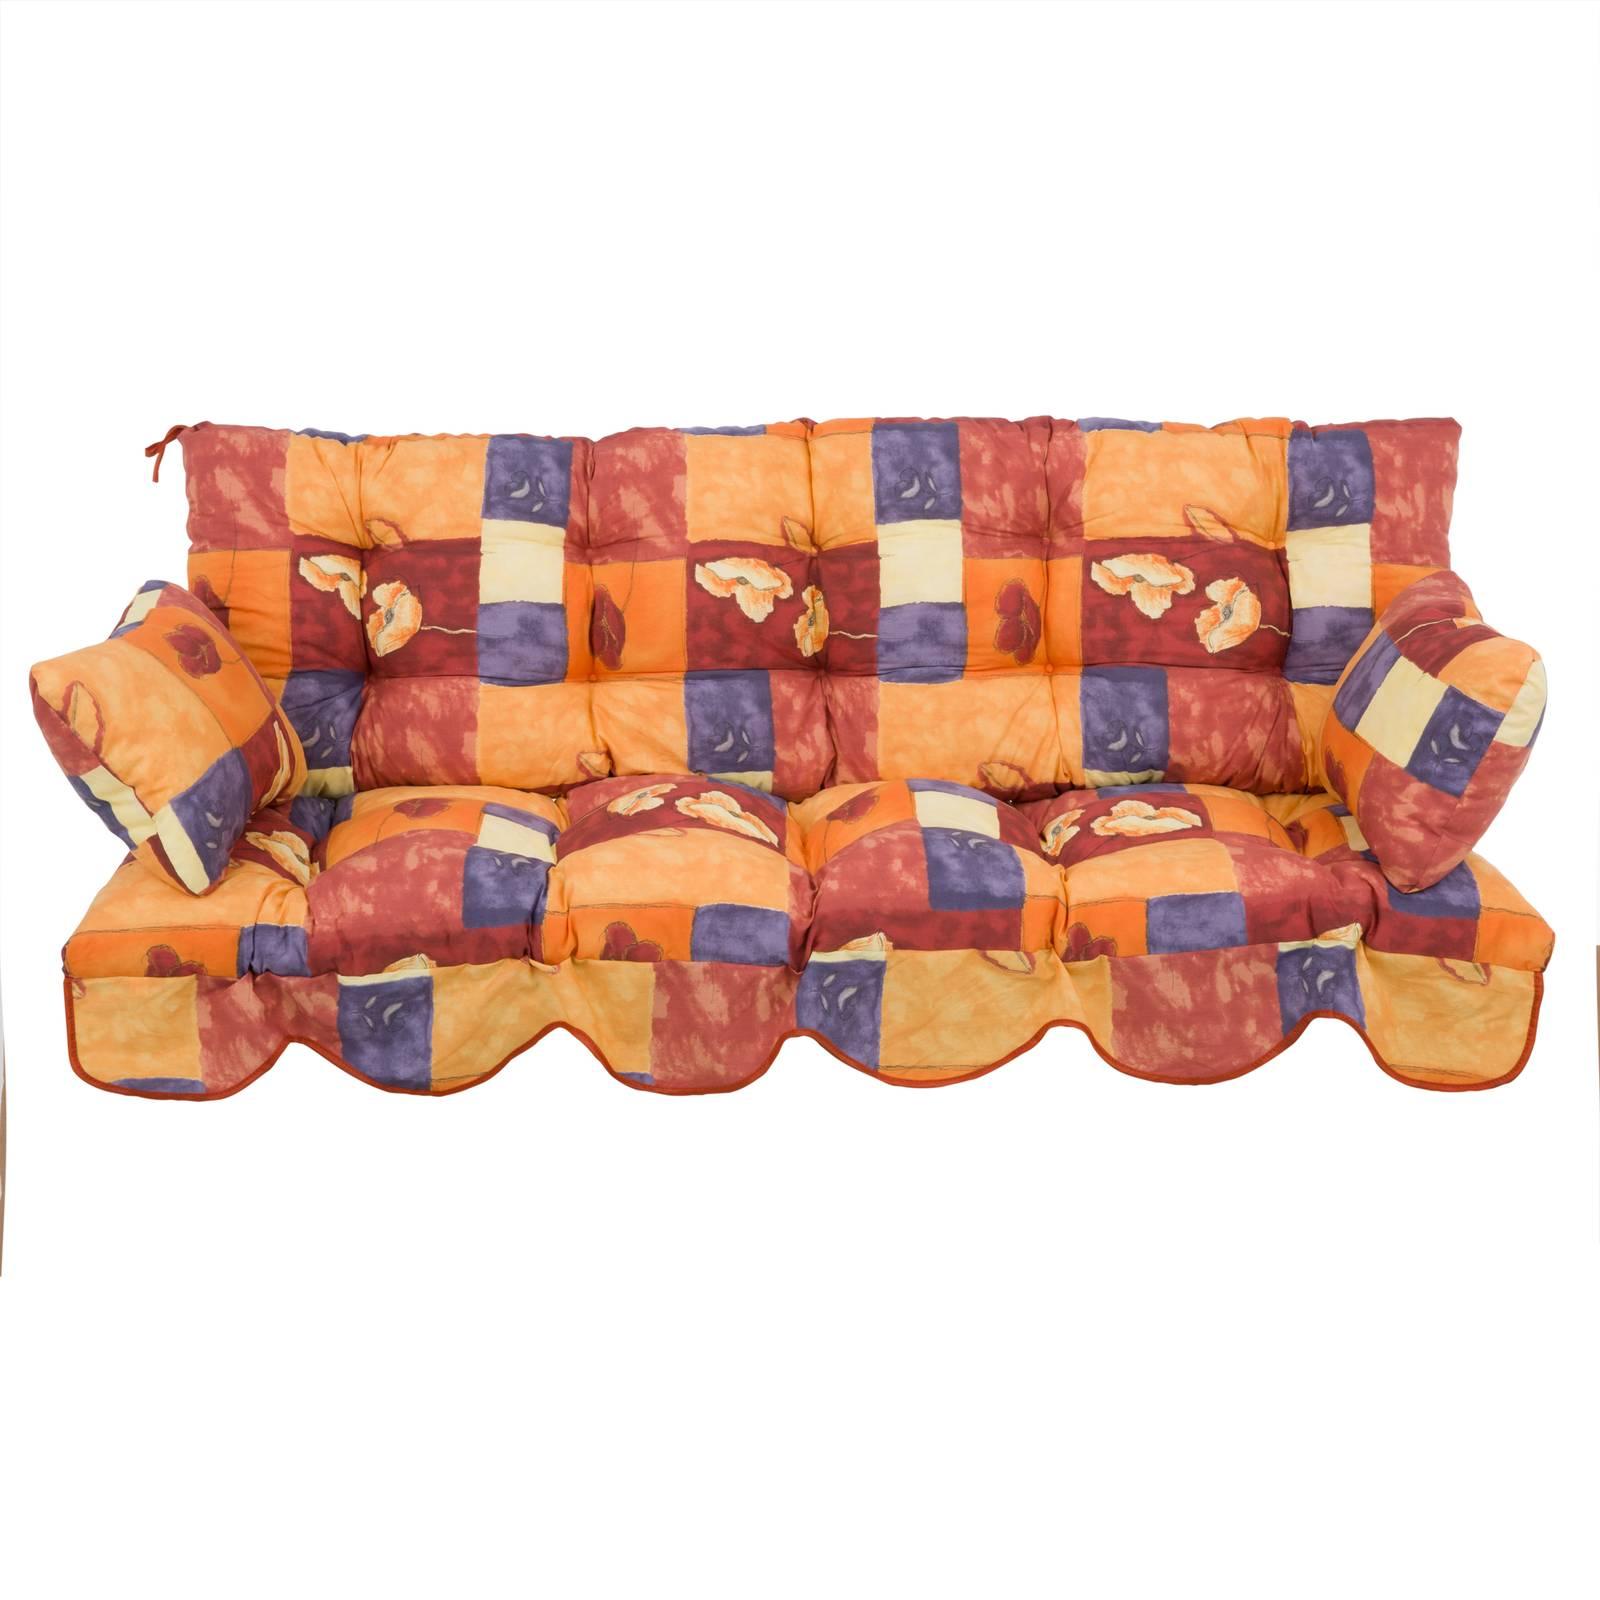 Poduszki na huśtawkę 170 cm Bora E013-03PB PATIO